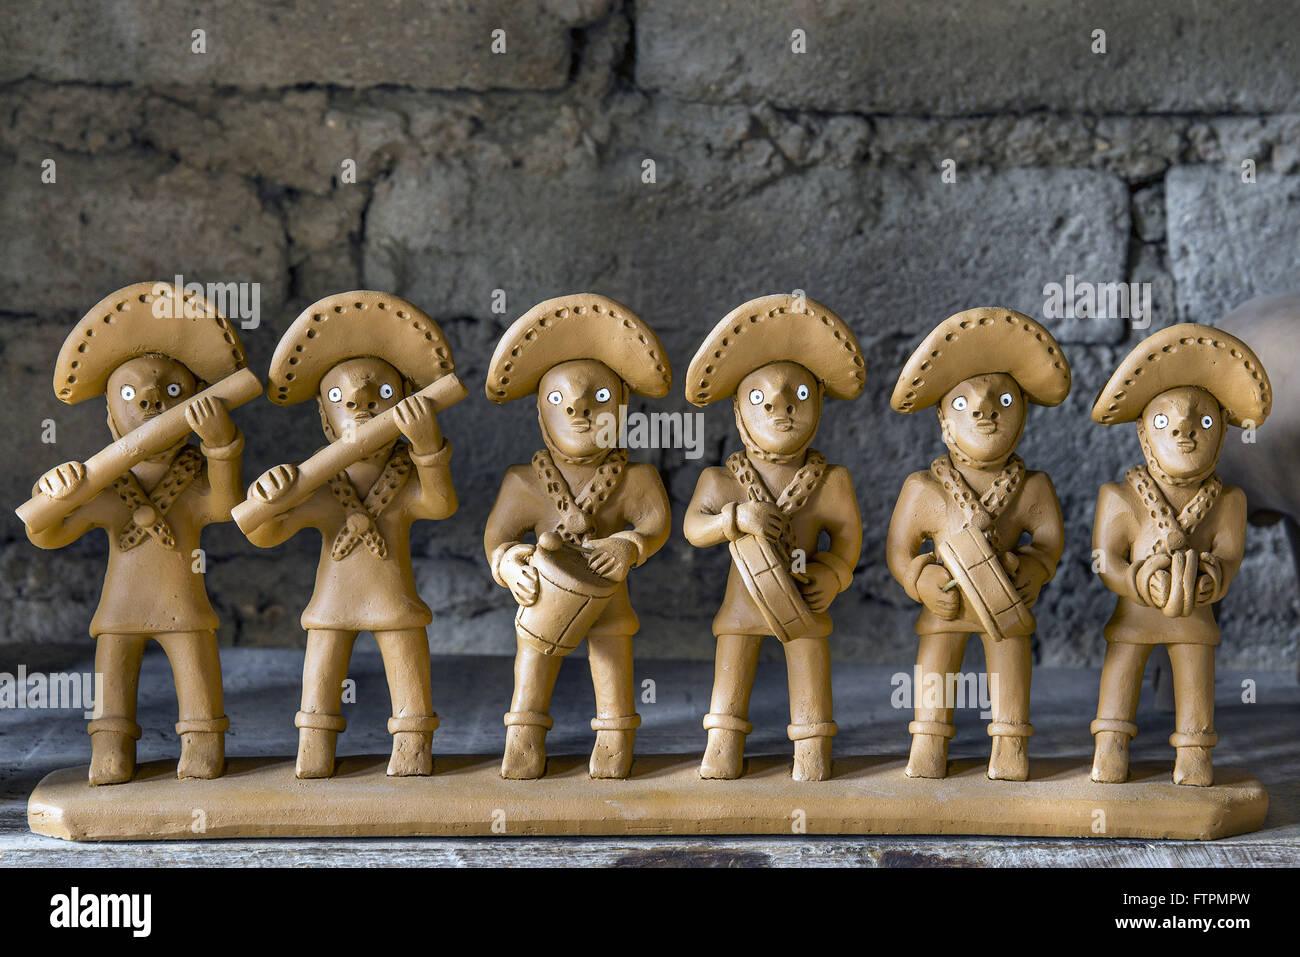 Bonecos de barro representando una banda de Pifanos de Caruaru - artesao Severino Vitalino Immagini Stock